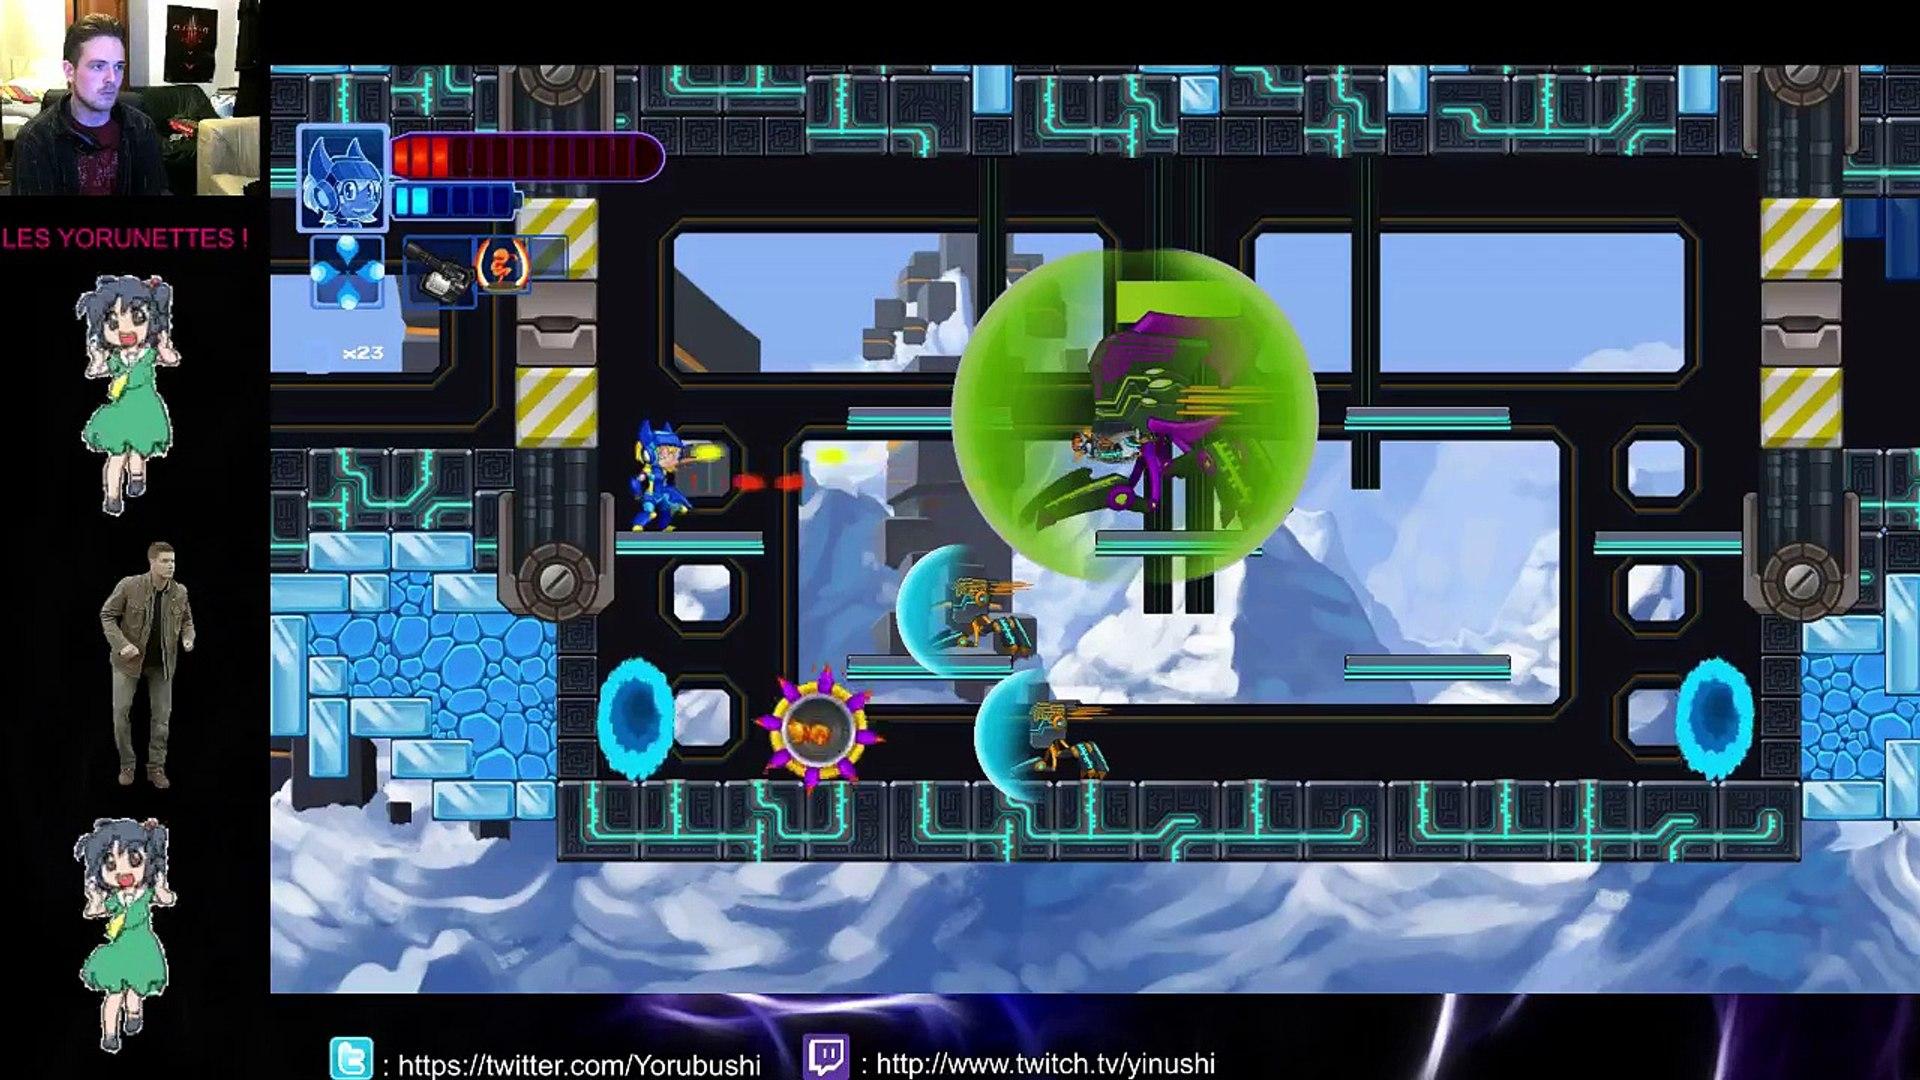 Yoru play :[PEGI18] Momodora III on retourne dans du HYPE après le HYPE ! HYPE ! (20/12/2014 00:06)